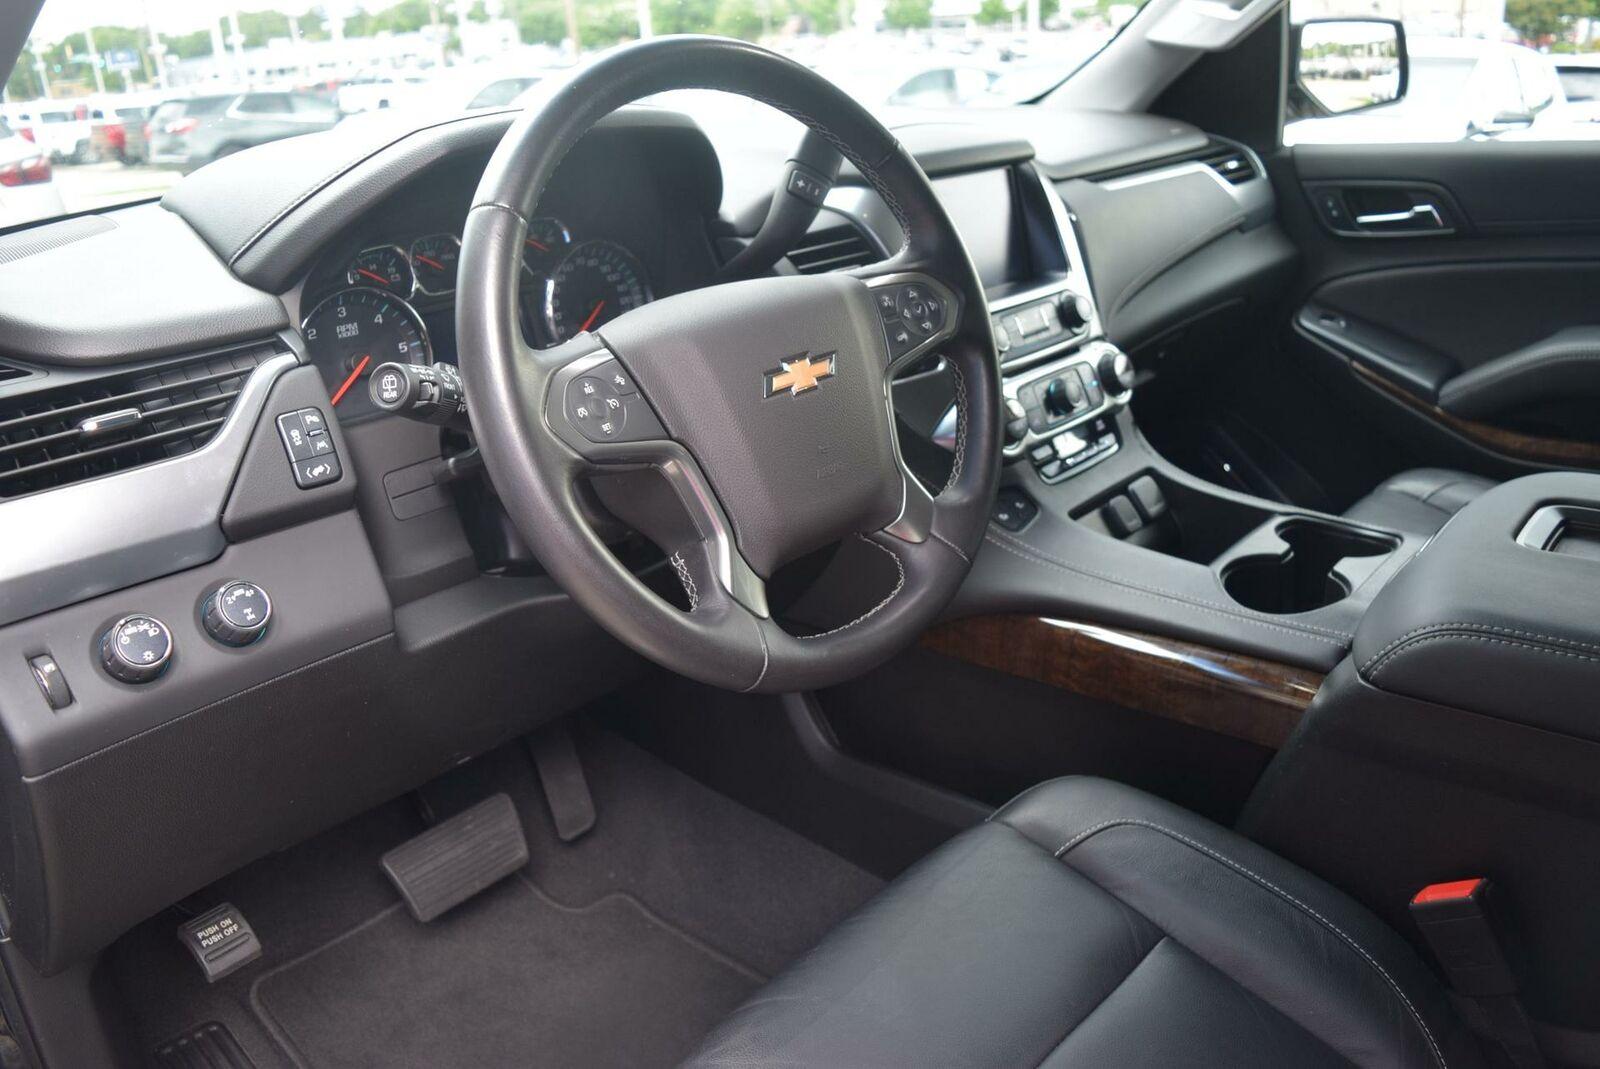 Chevrolet Suburban 2019 photo 3